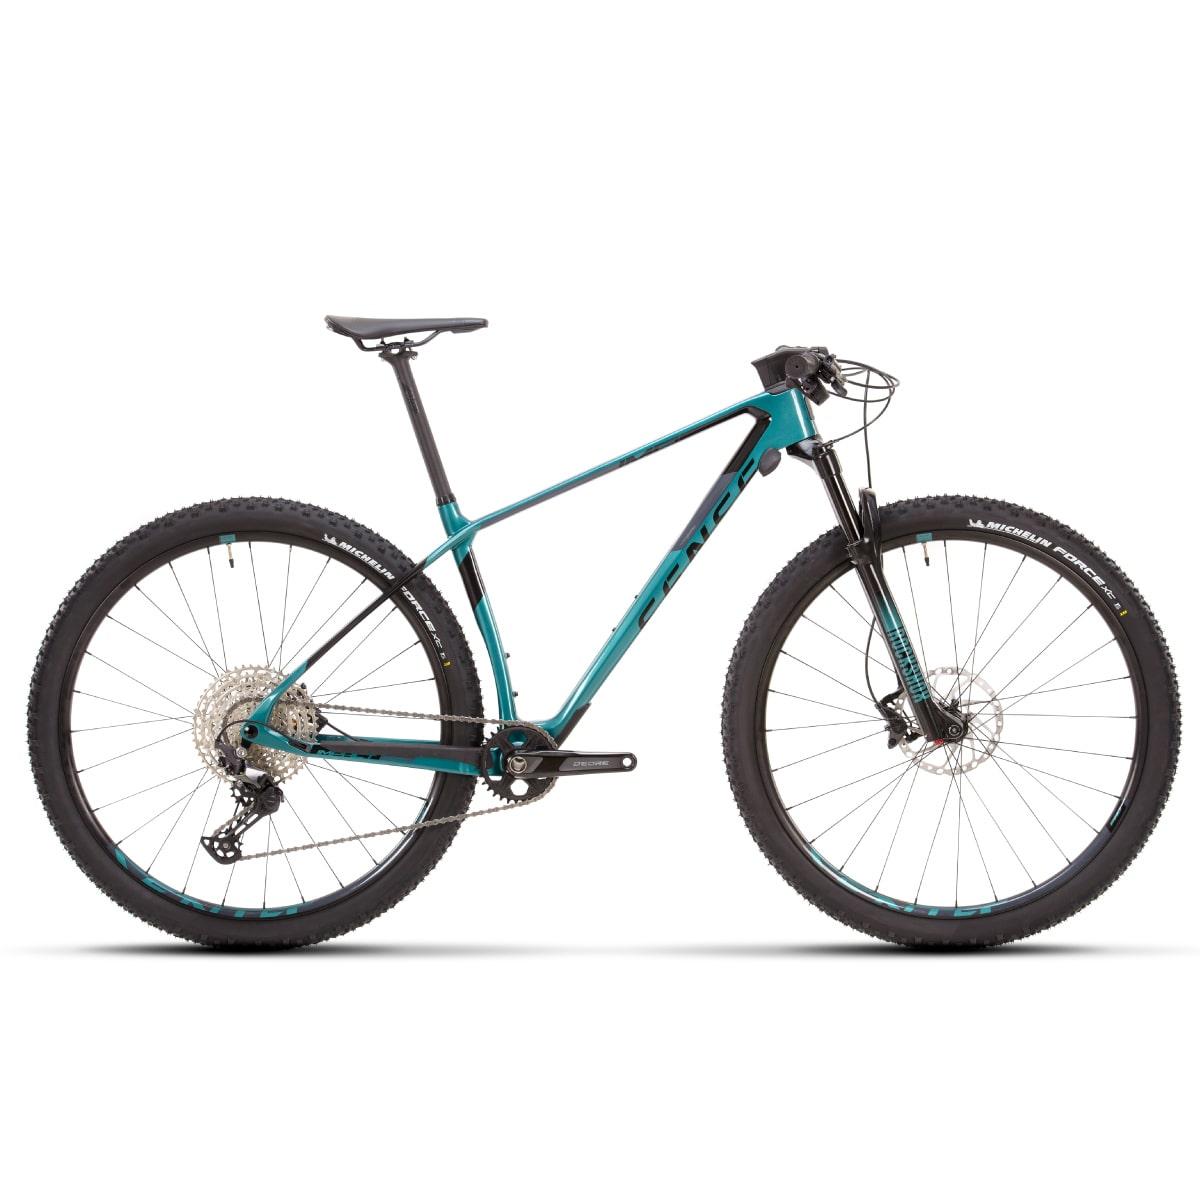 Bike Sense Impact Carbon Pro 2021 Shimano Deore 12v Verde e Cinza